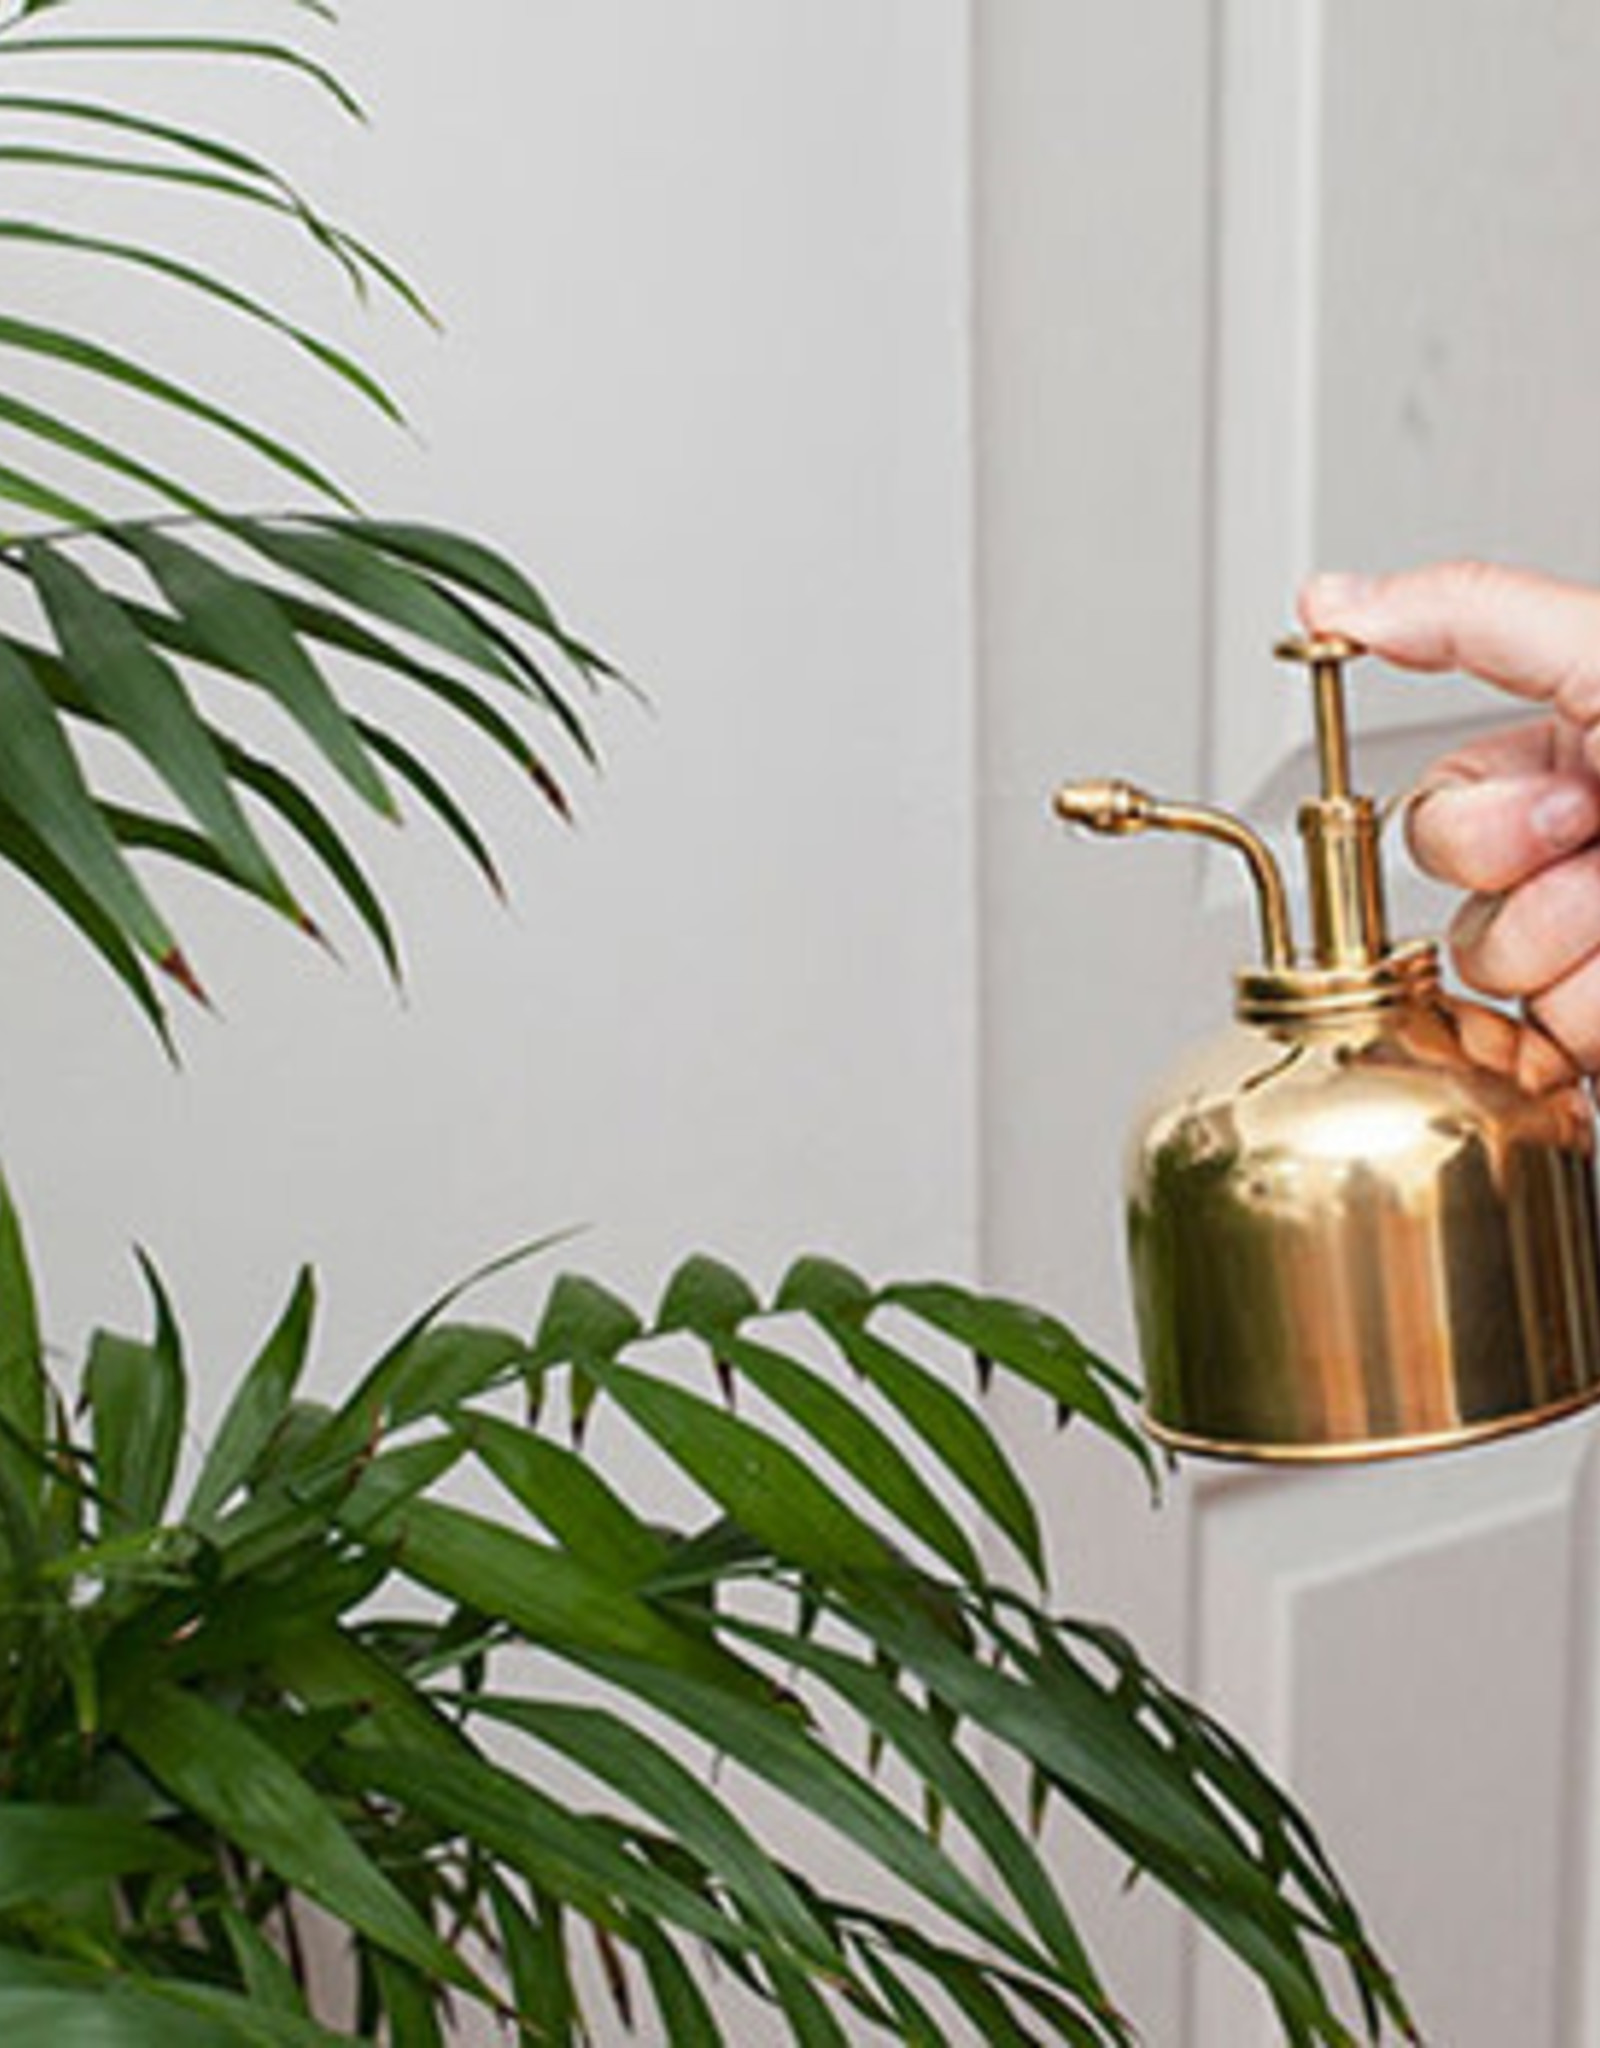 Kikkerland Plant sprayer Gold 300ml